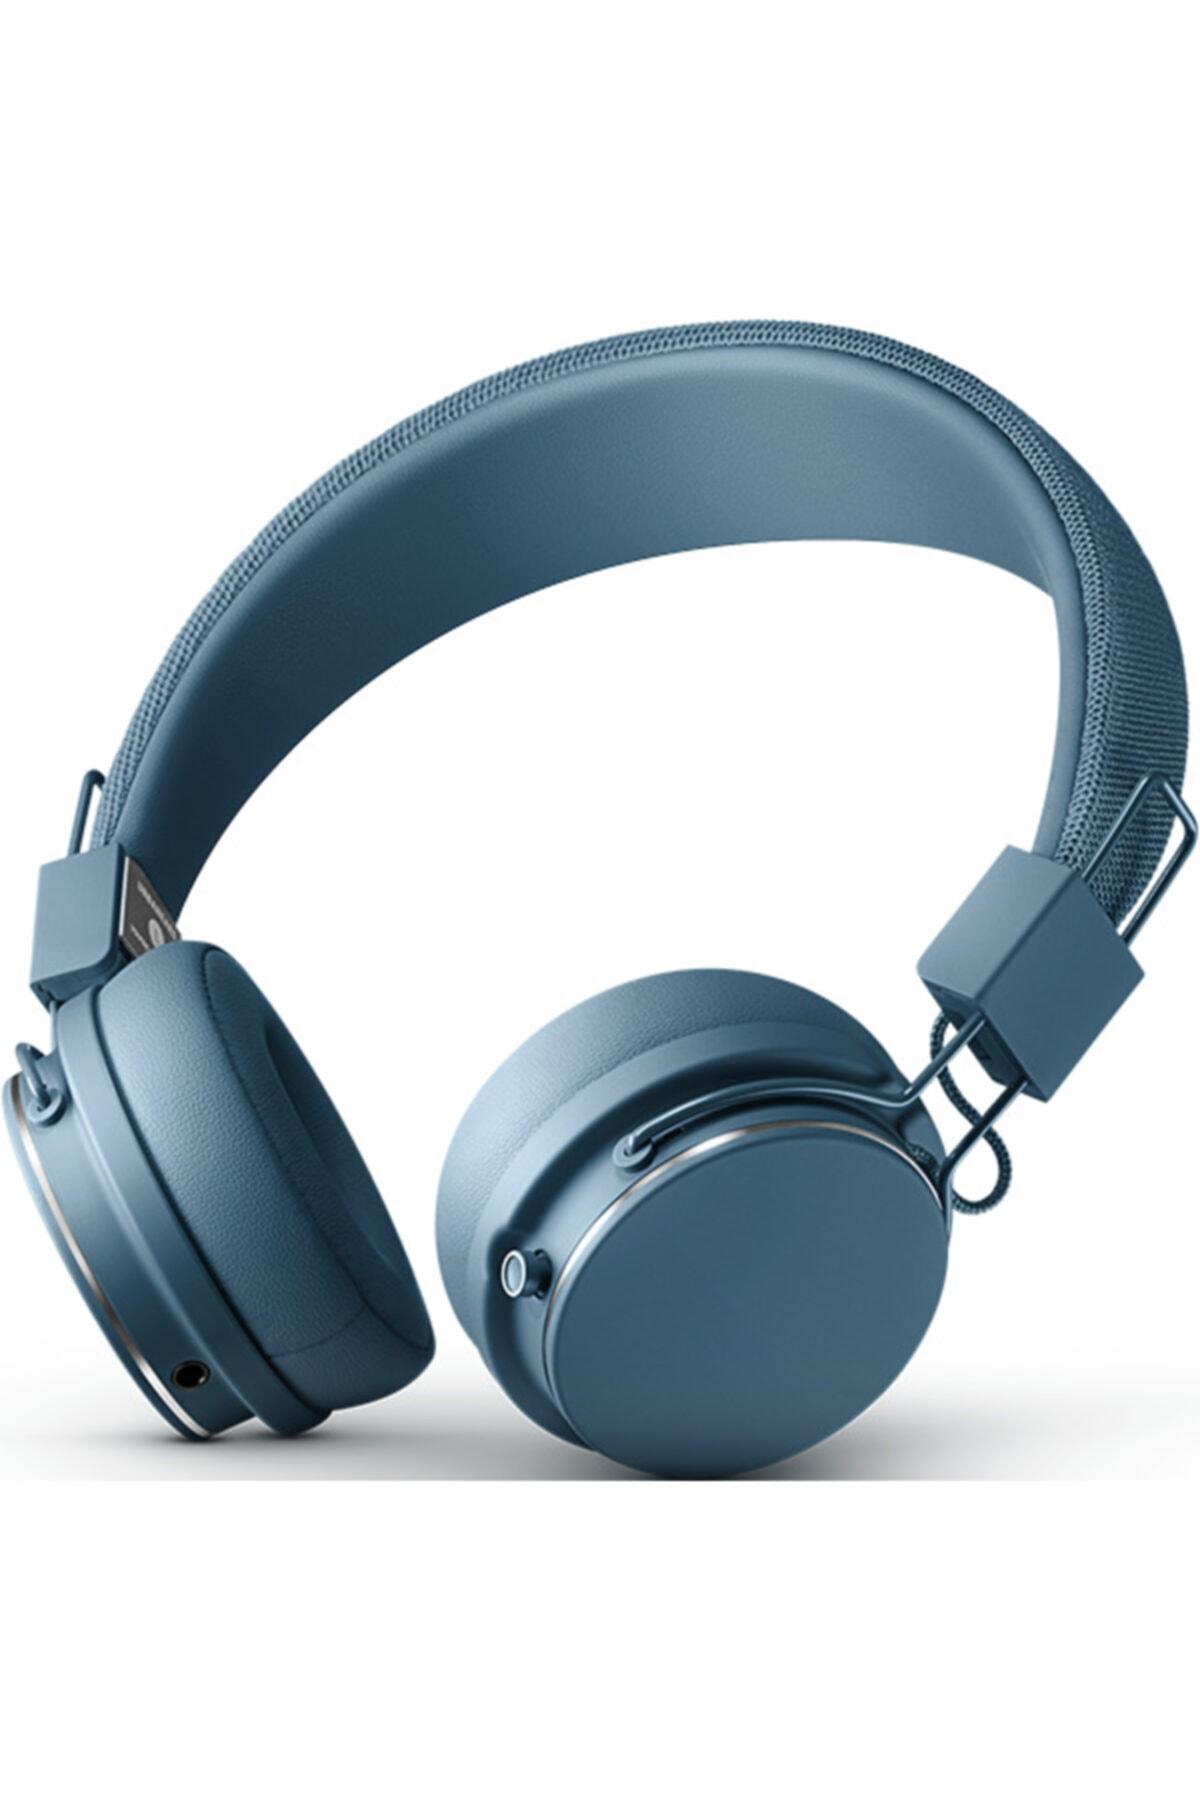 URBANEARS Plattan II Bt Kulak Üstü Bluetooth Kulaklık - Indigo 1